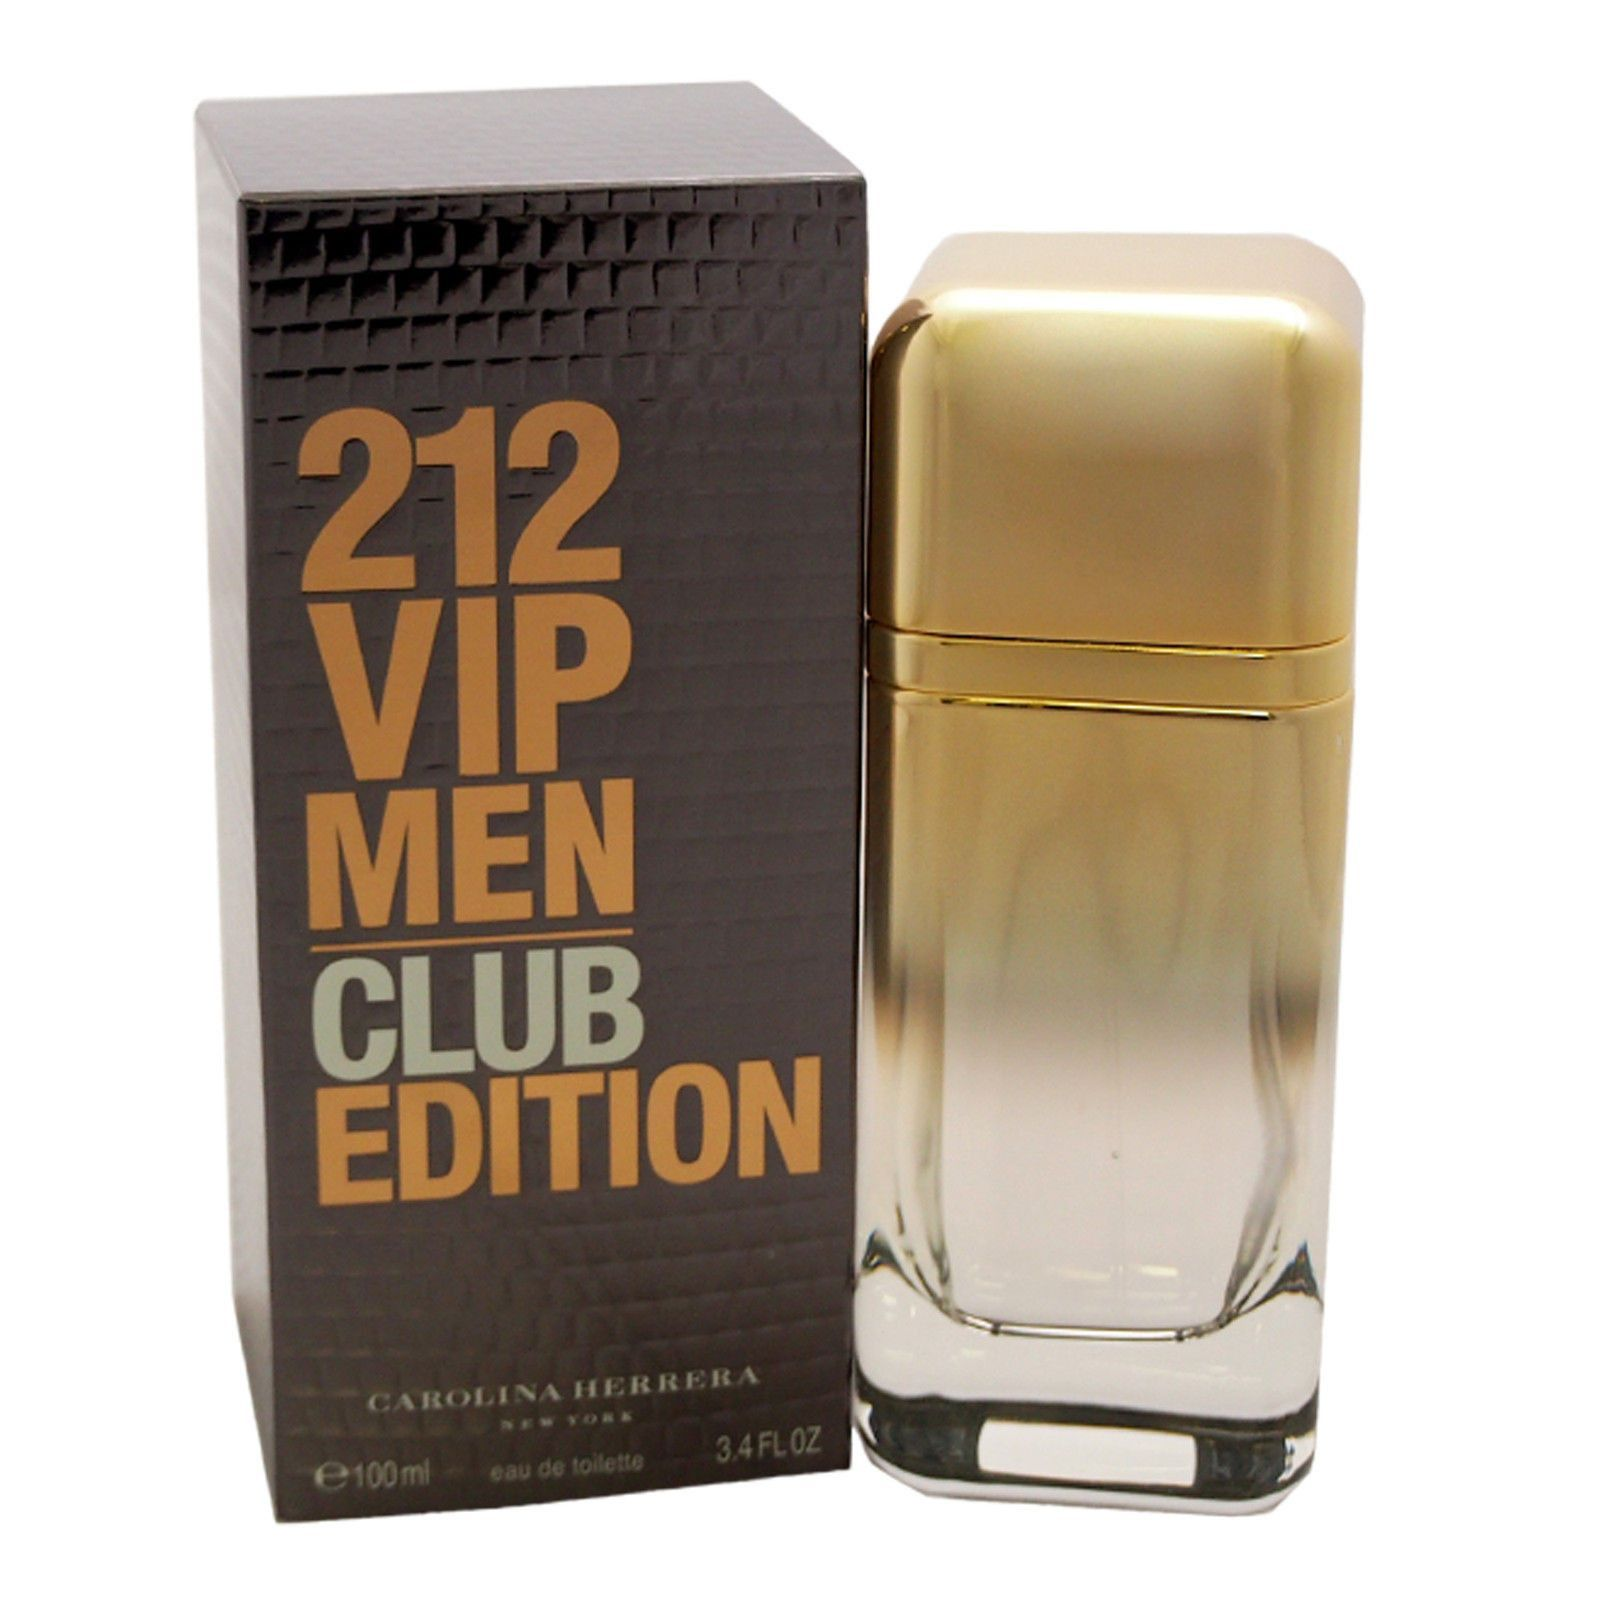 Carolina Herrera 212 Vip Men Club Edition Edt 100ml 8411061804049